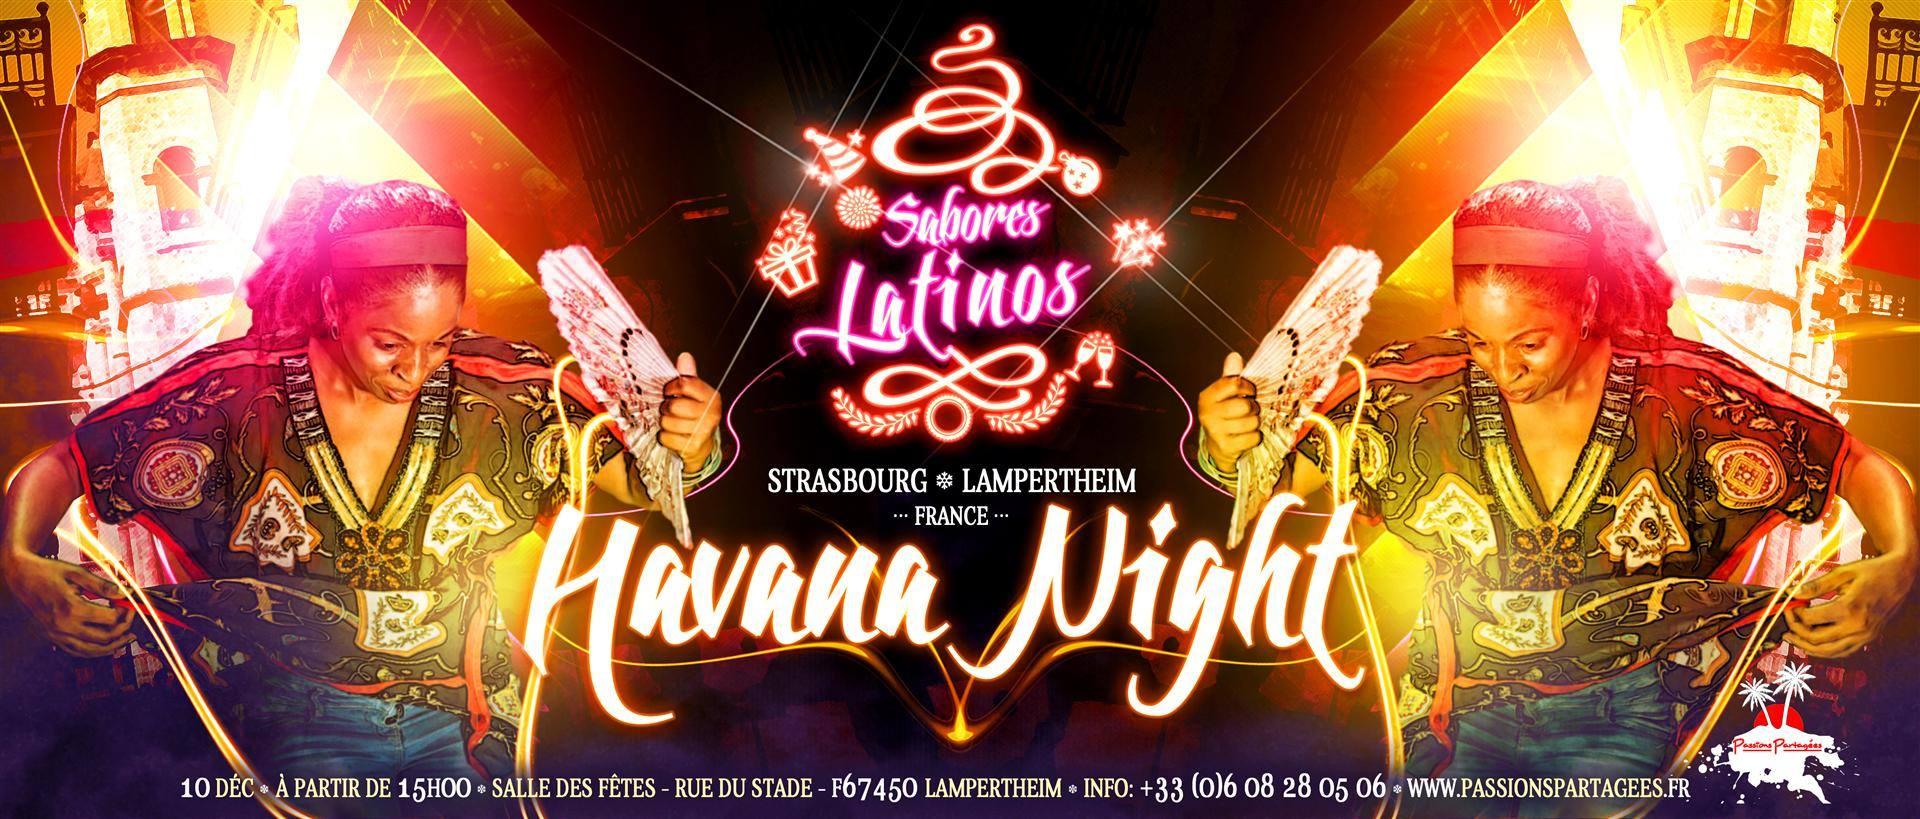 banner sabores latinos